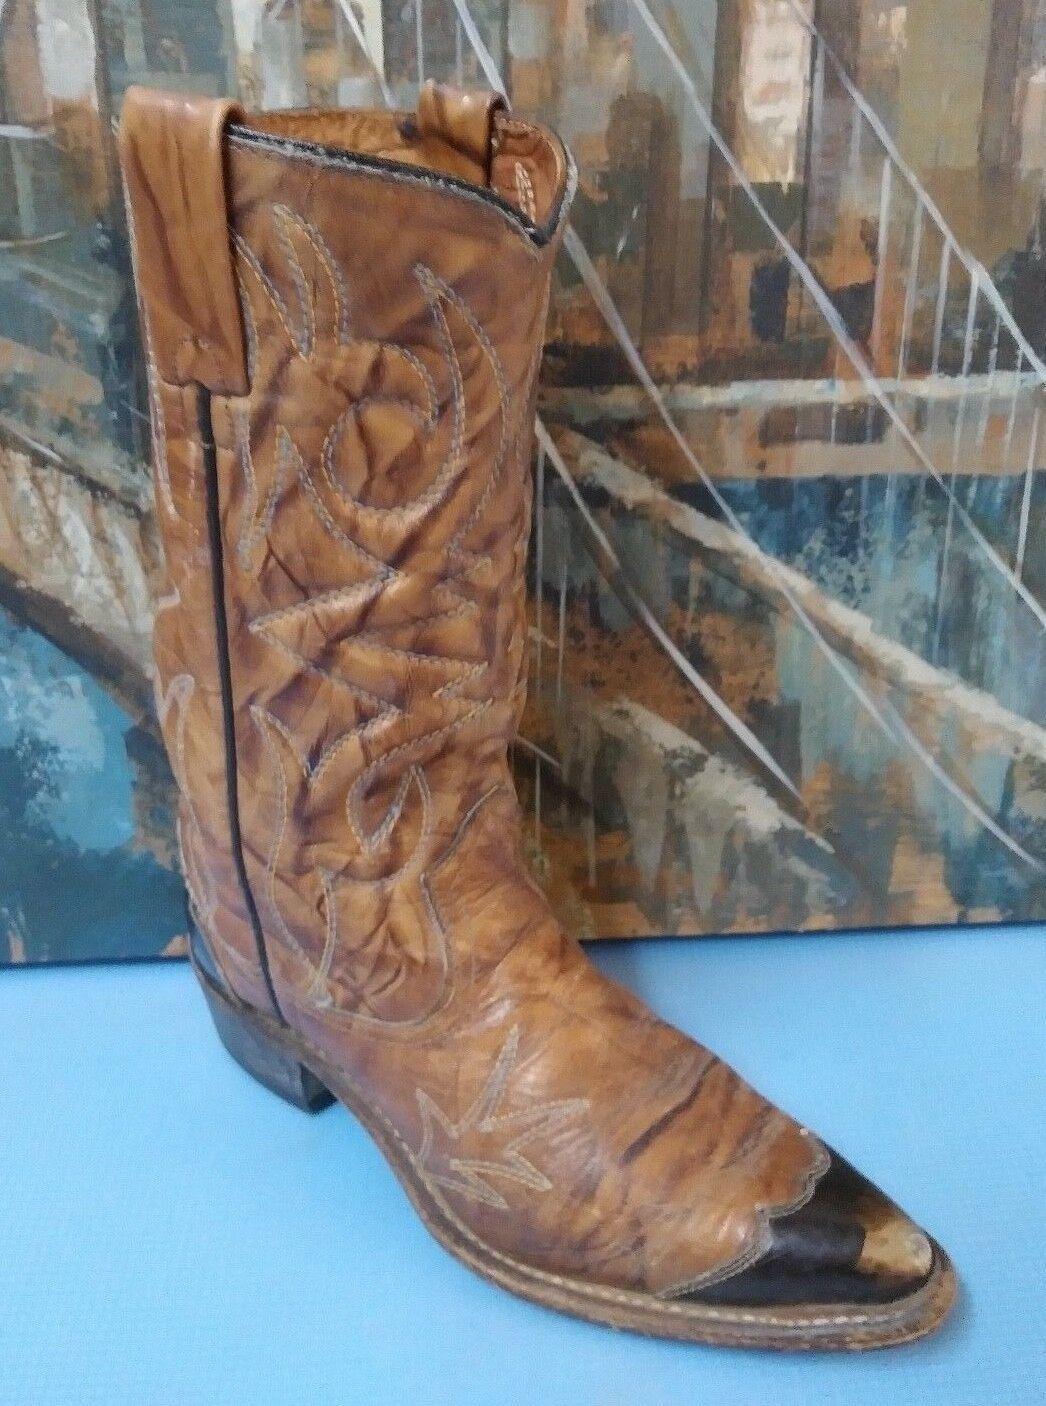 Vintage Texas démarrage Co Saddlemarron Western en cuir bottes femme taille 6.5 C